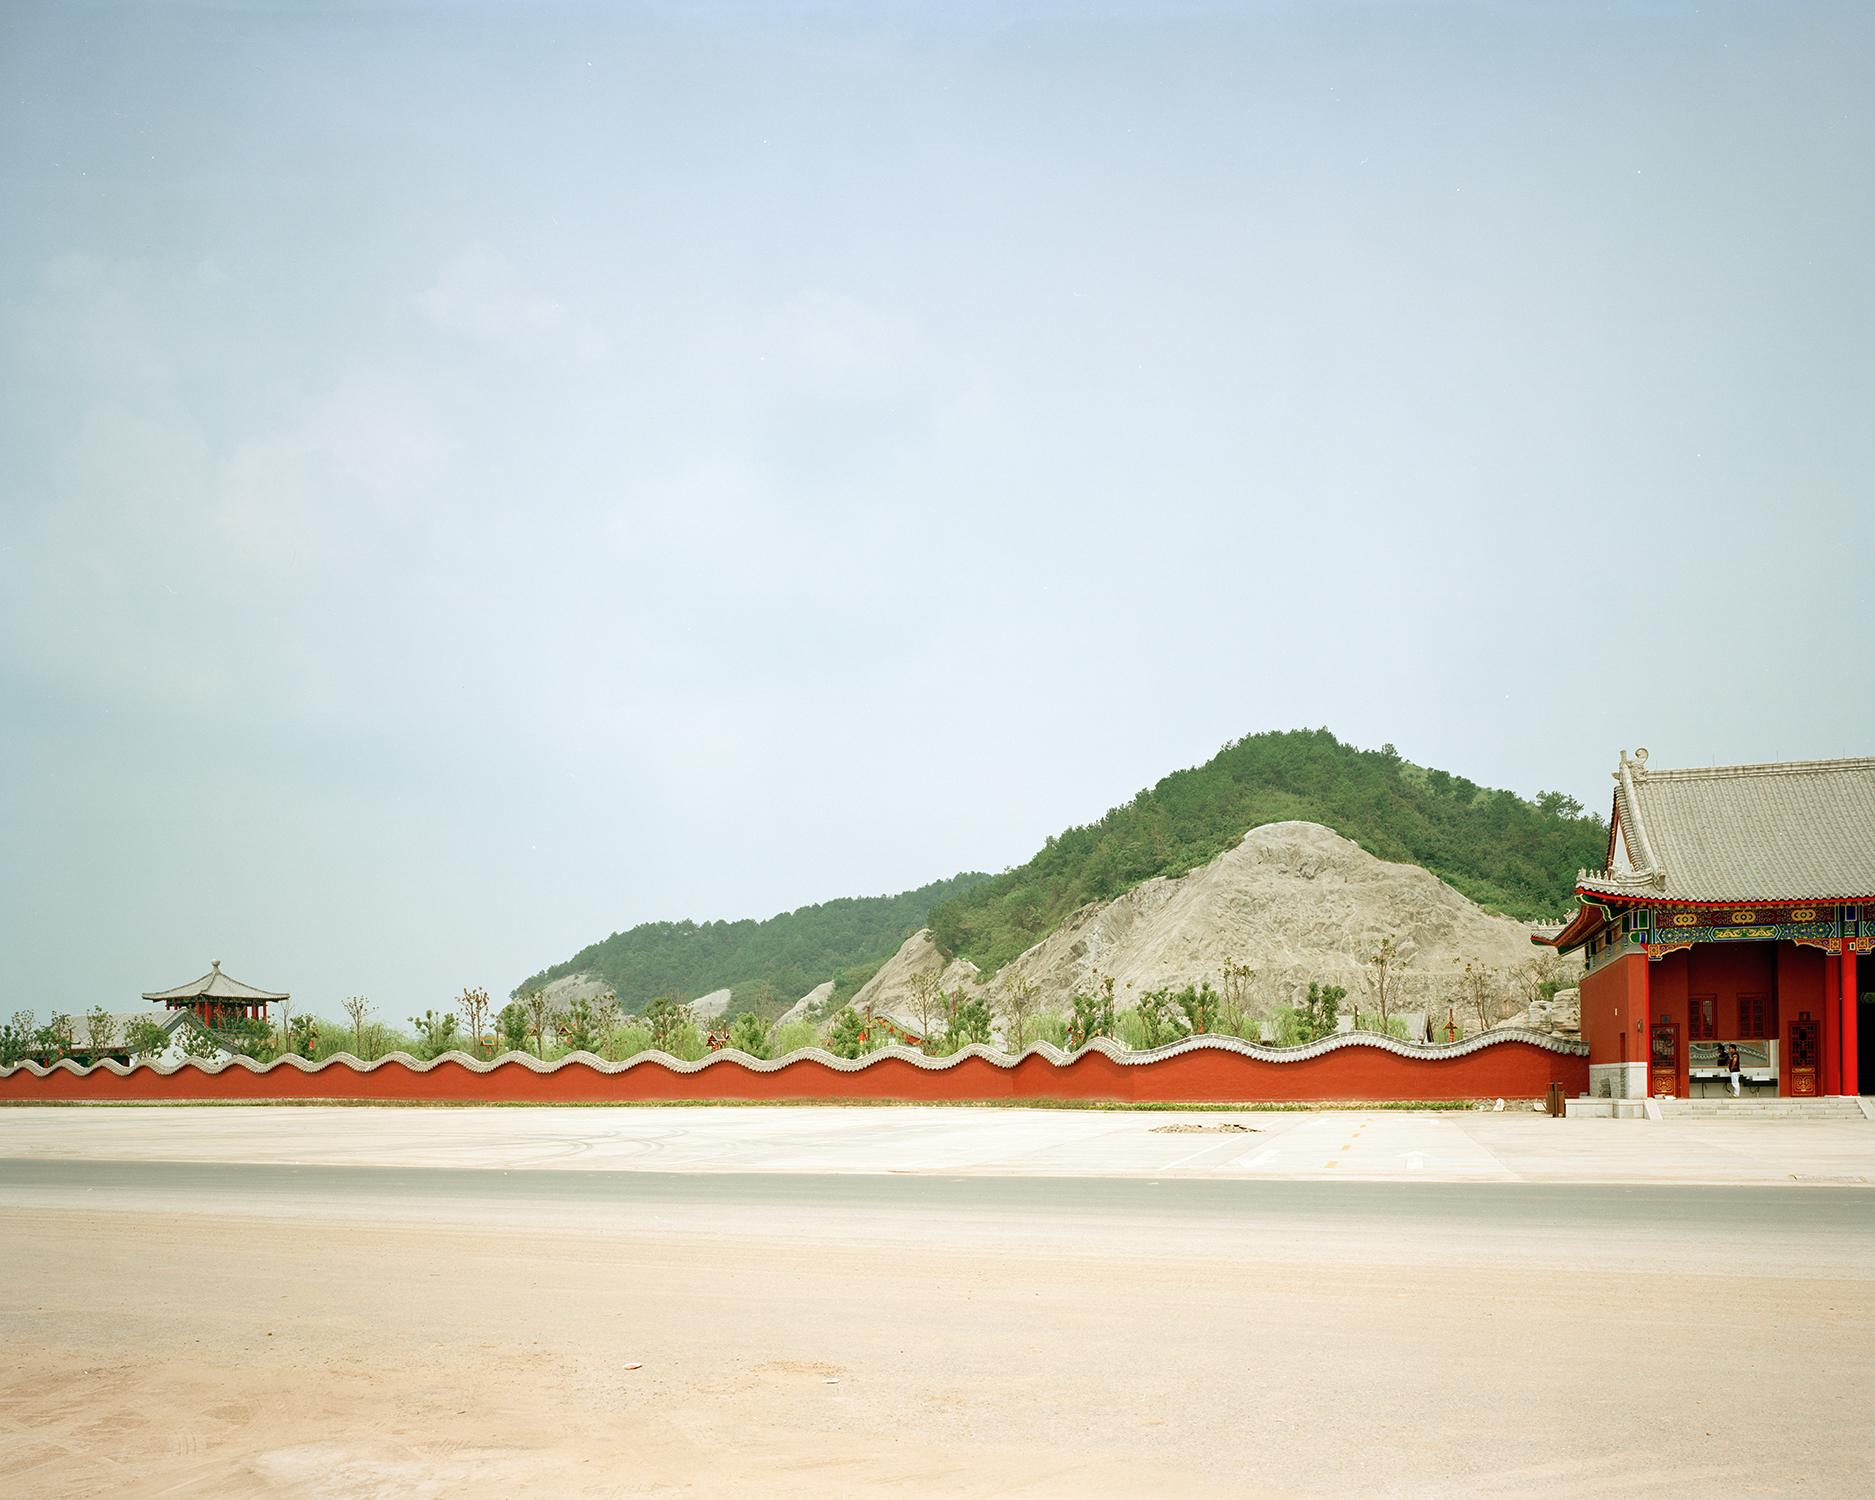 chen-ronghui-2015-8-16-photography-of-china.jpg